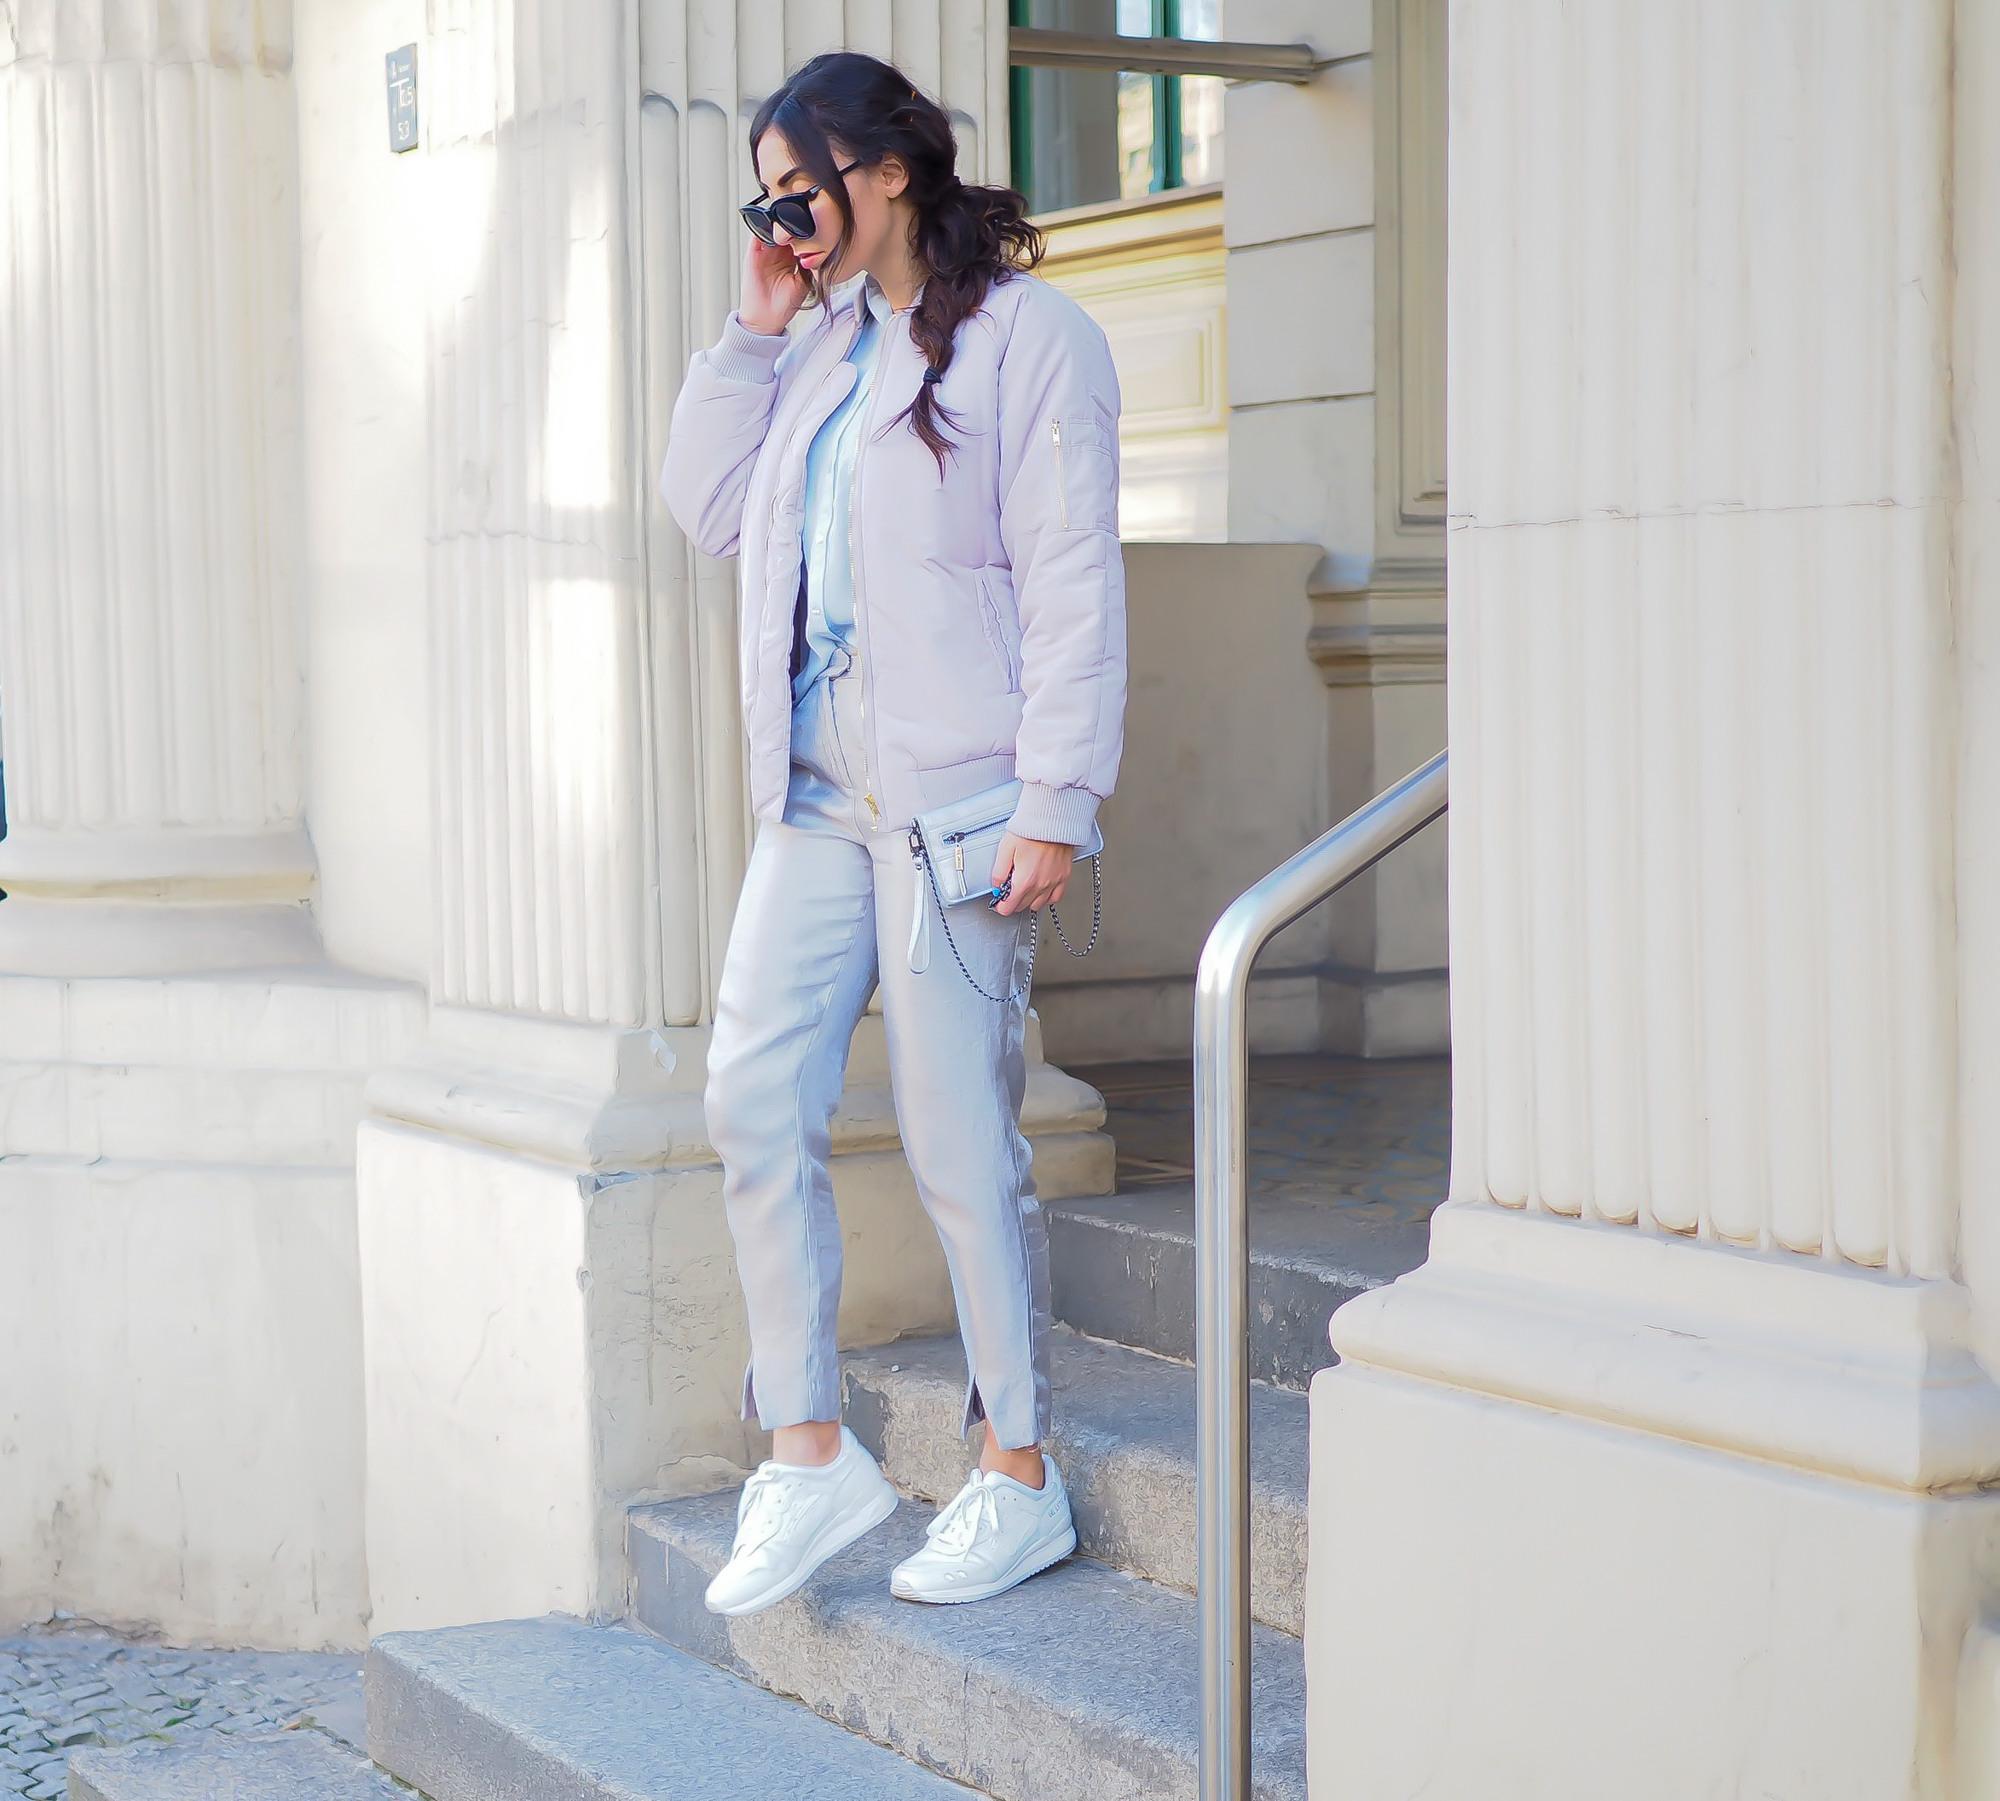 boohoo pastel lilac bomber quilted blouson trend silver pants H&M cigarette zigarettenhose light blouse bag minimal scandinavian spring look samieze fashionblog blogger deutschland streetstyle asics gel lyte women